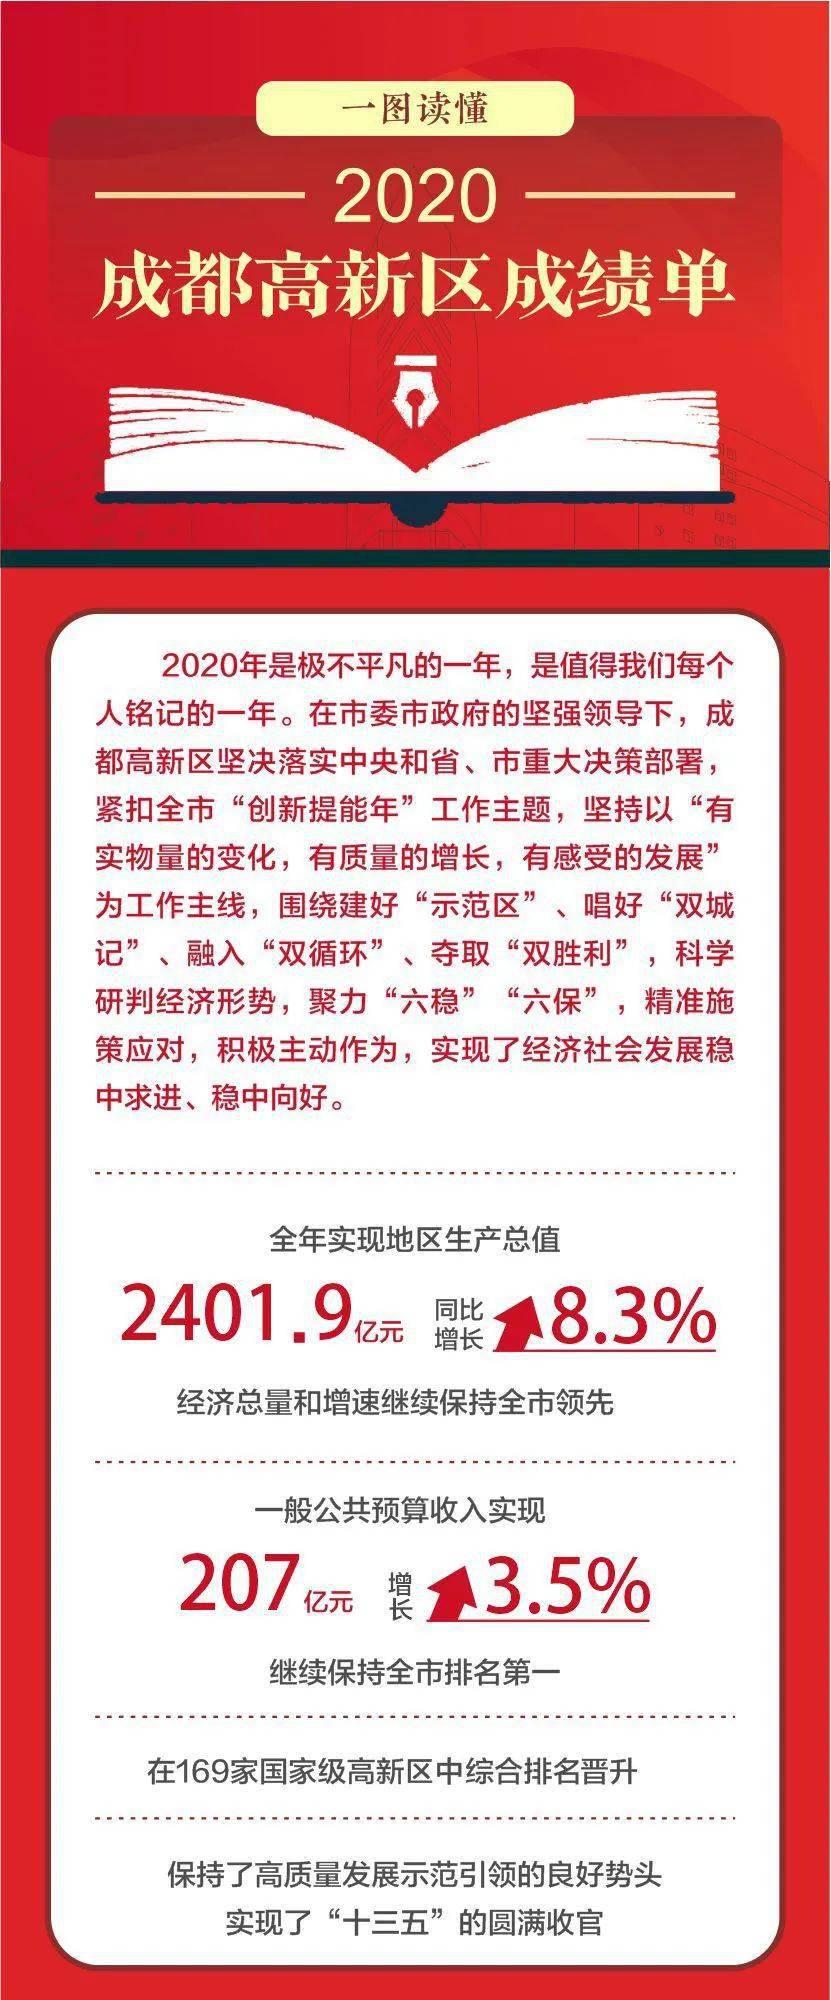 GDP突破2400亿元,逆势增长8.3%!